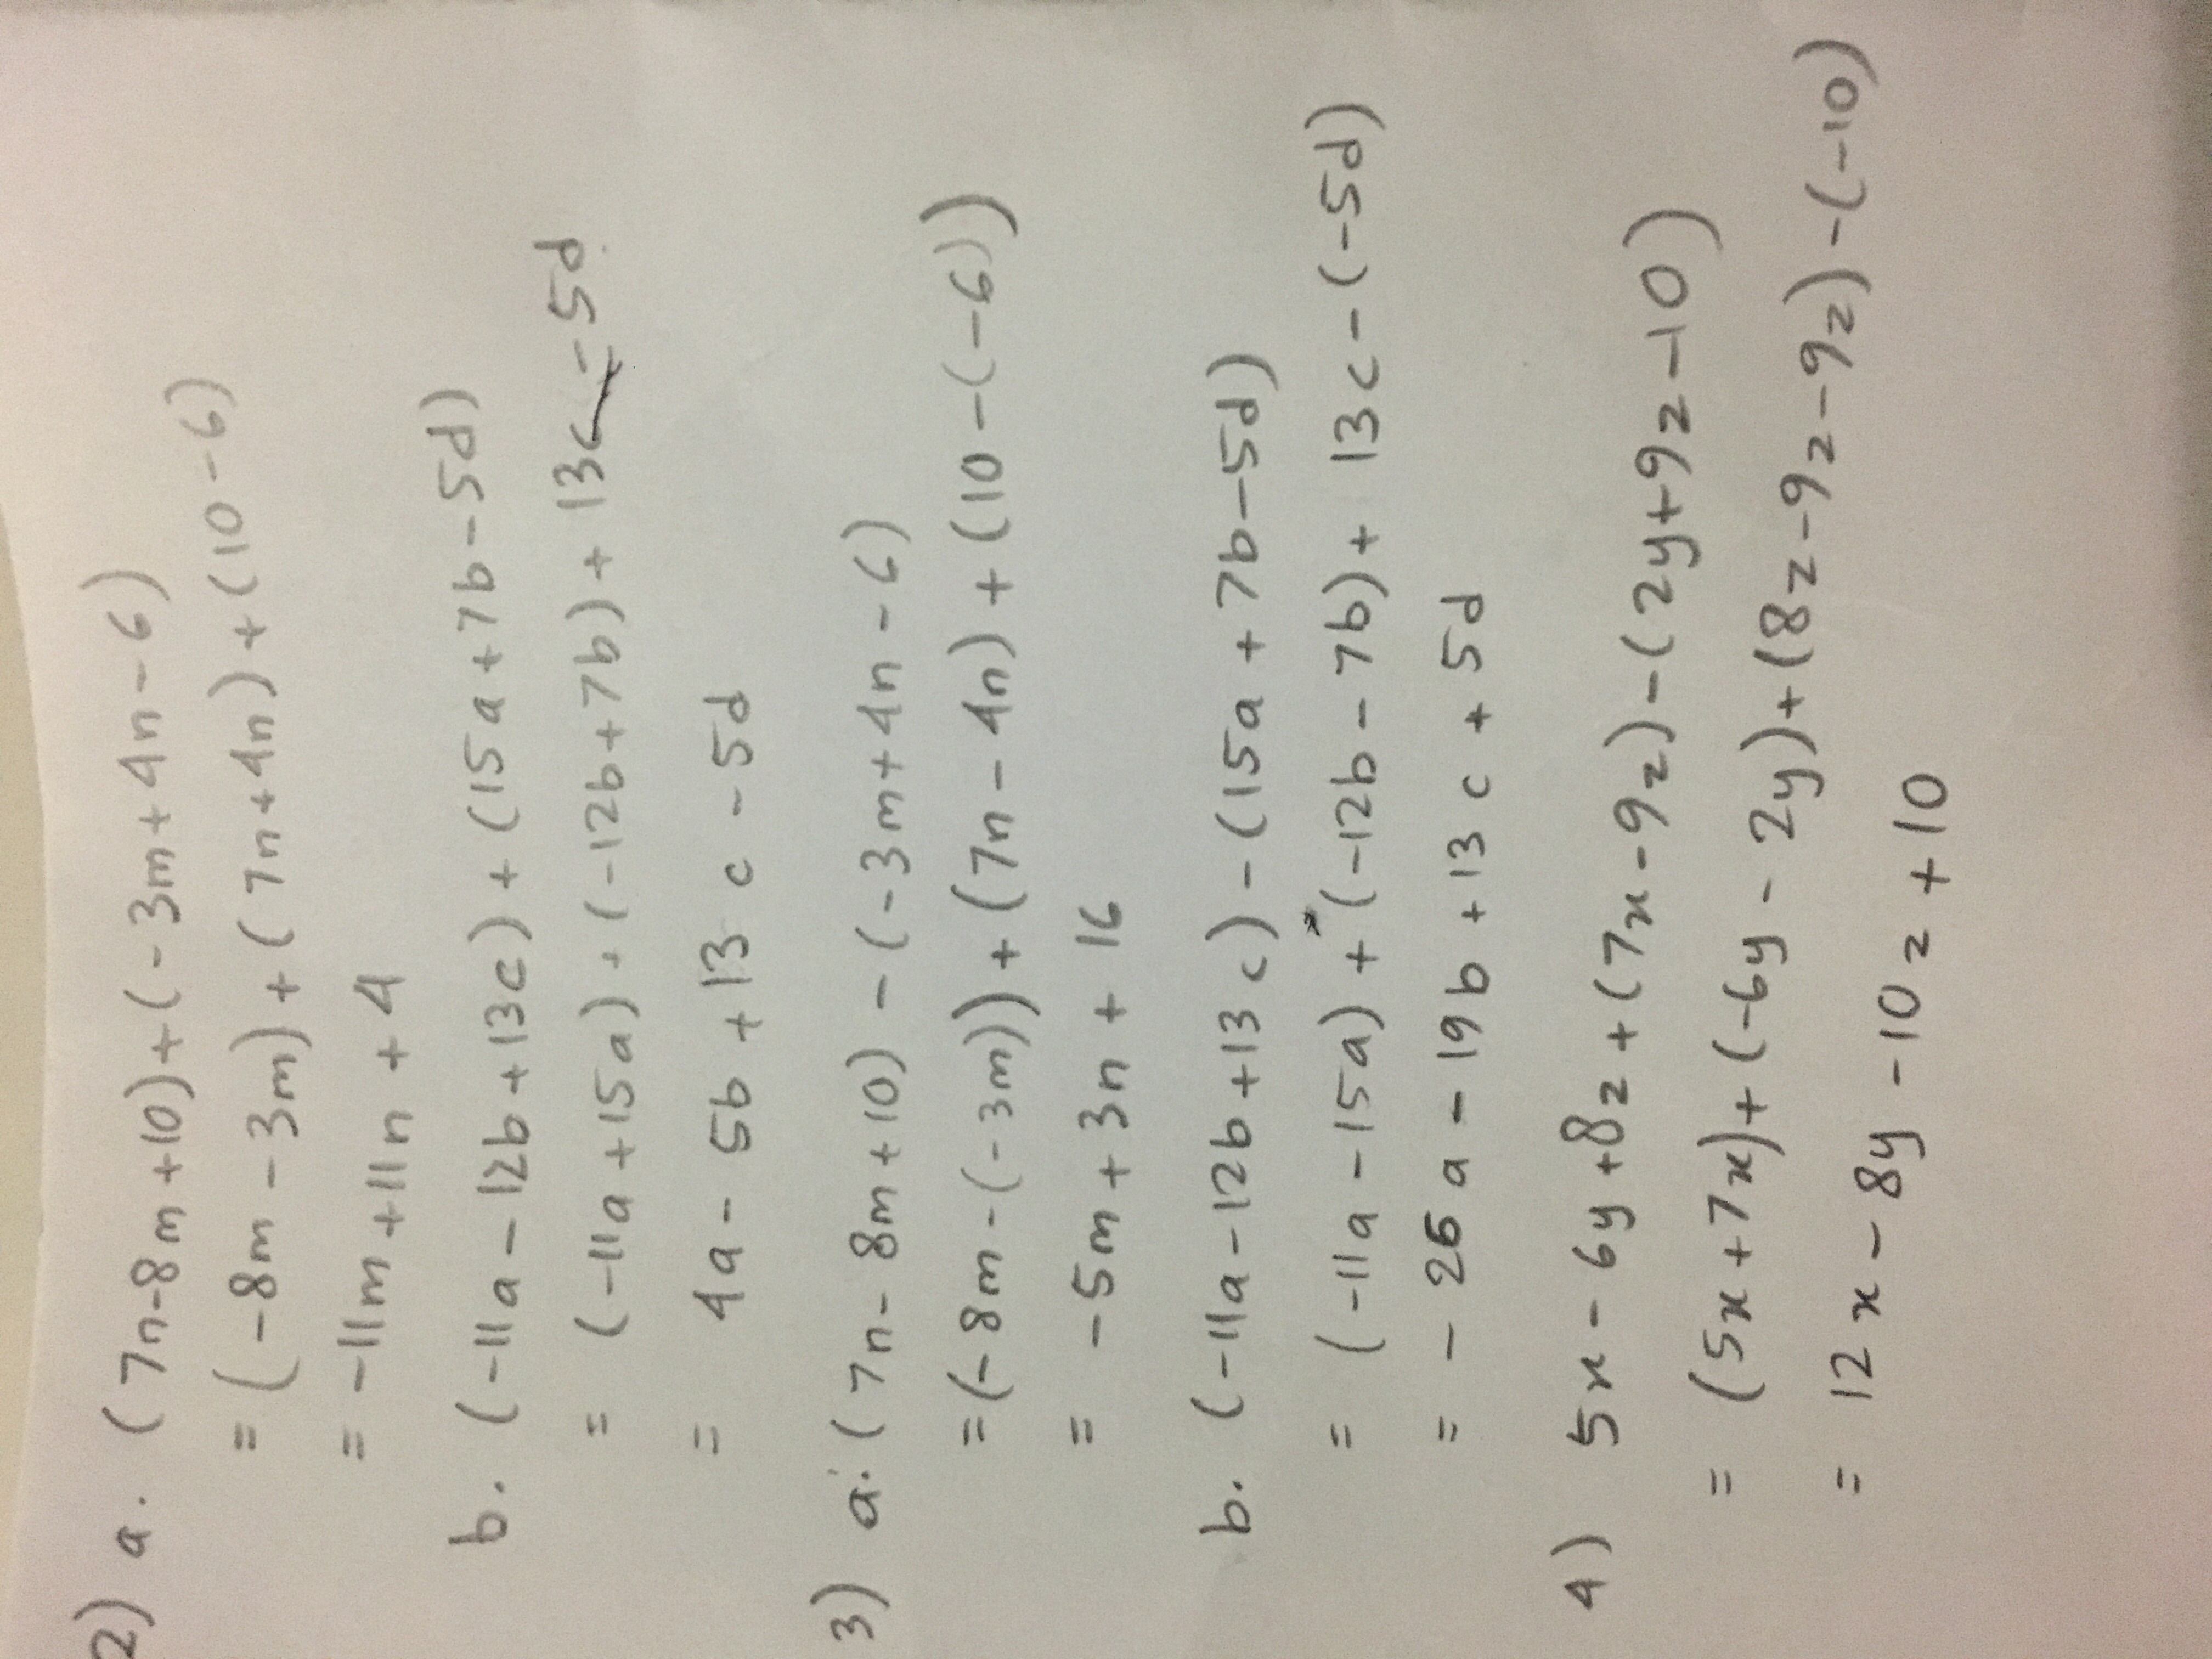 Penjumlahan Bentuk Aljabar : penjumlahan, bentuk, aljabar, Tentukan, Penjumlahan, Bentuk, Aljabar, Berikut, Dengan, Brainly.co.id